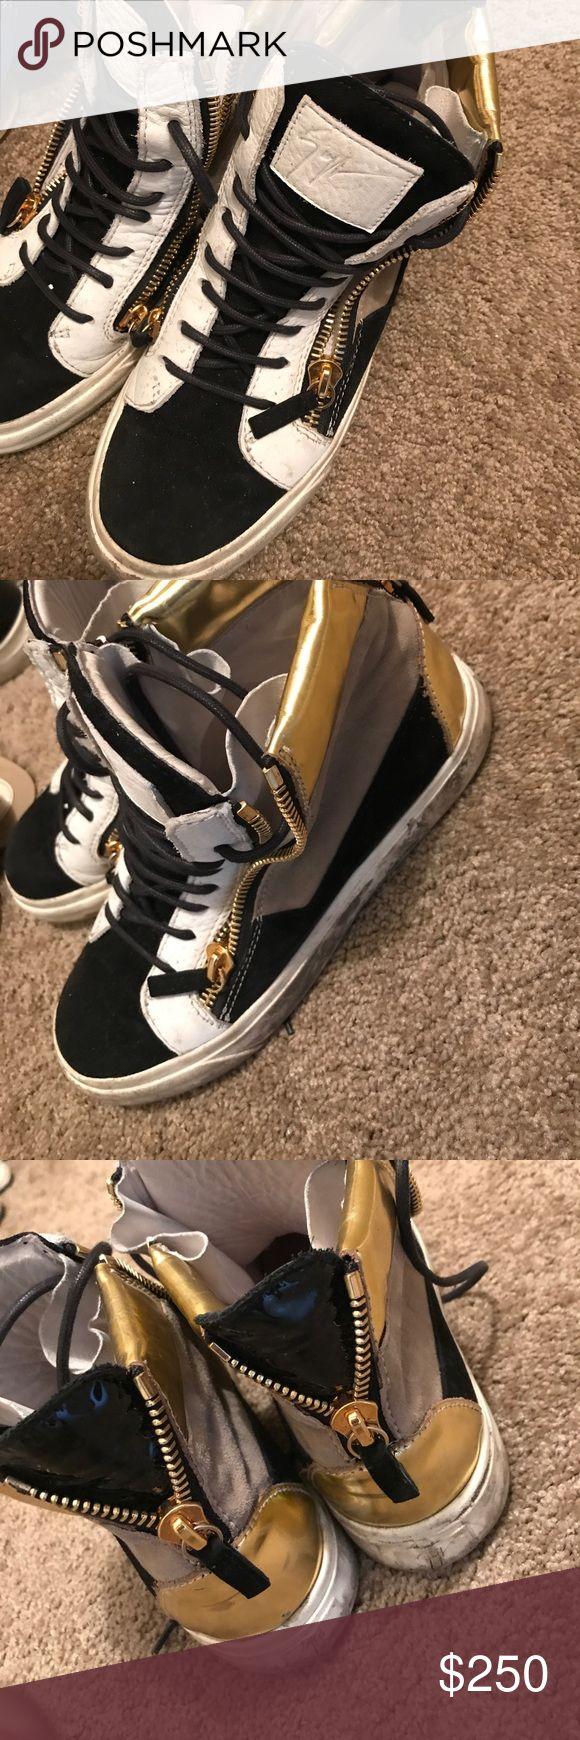 Giuseppe sneakers , worn! Black , white and tan designer sneakers Giuseppe Zanotti Shoes Sneakers